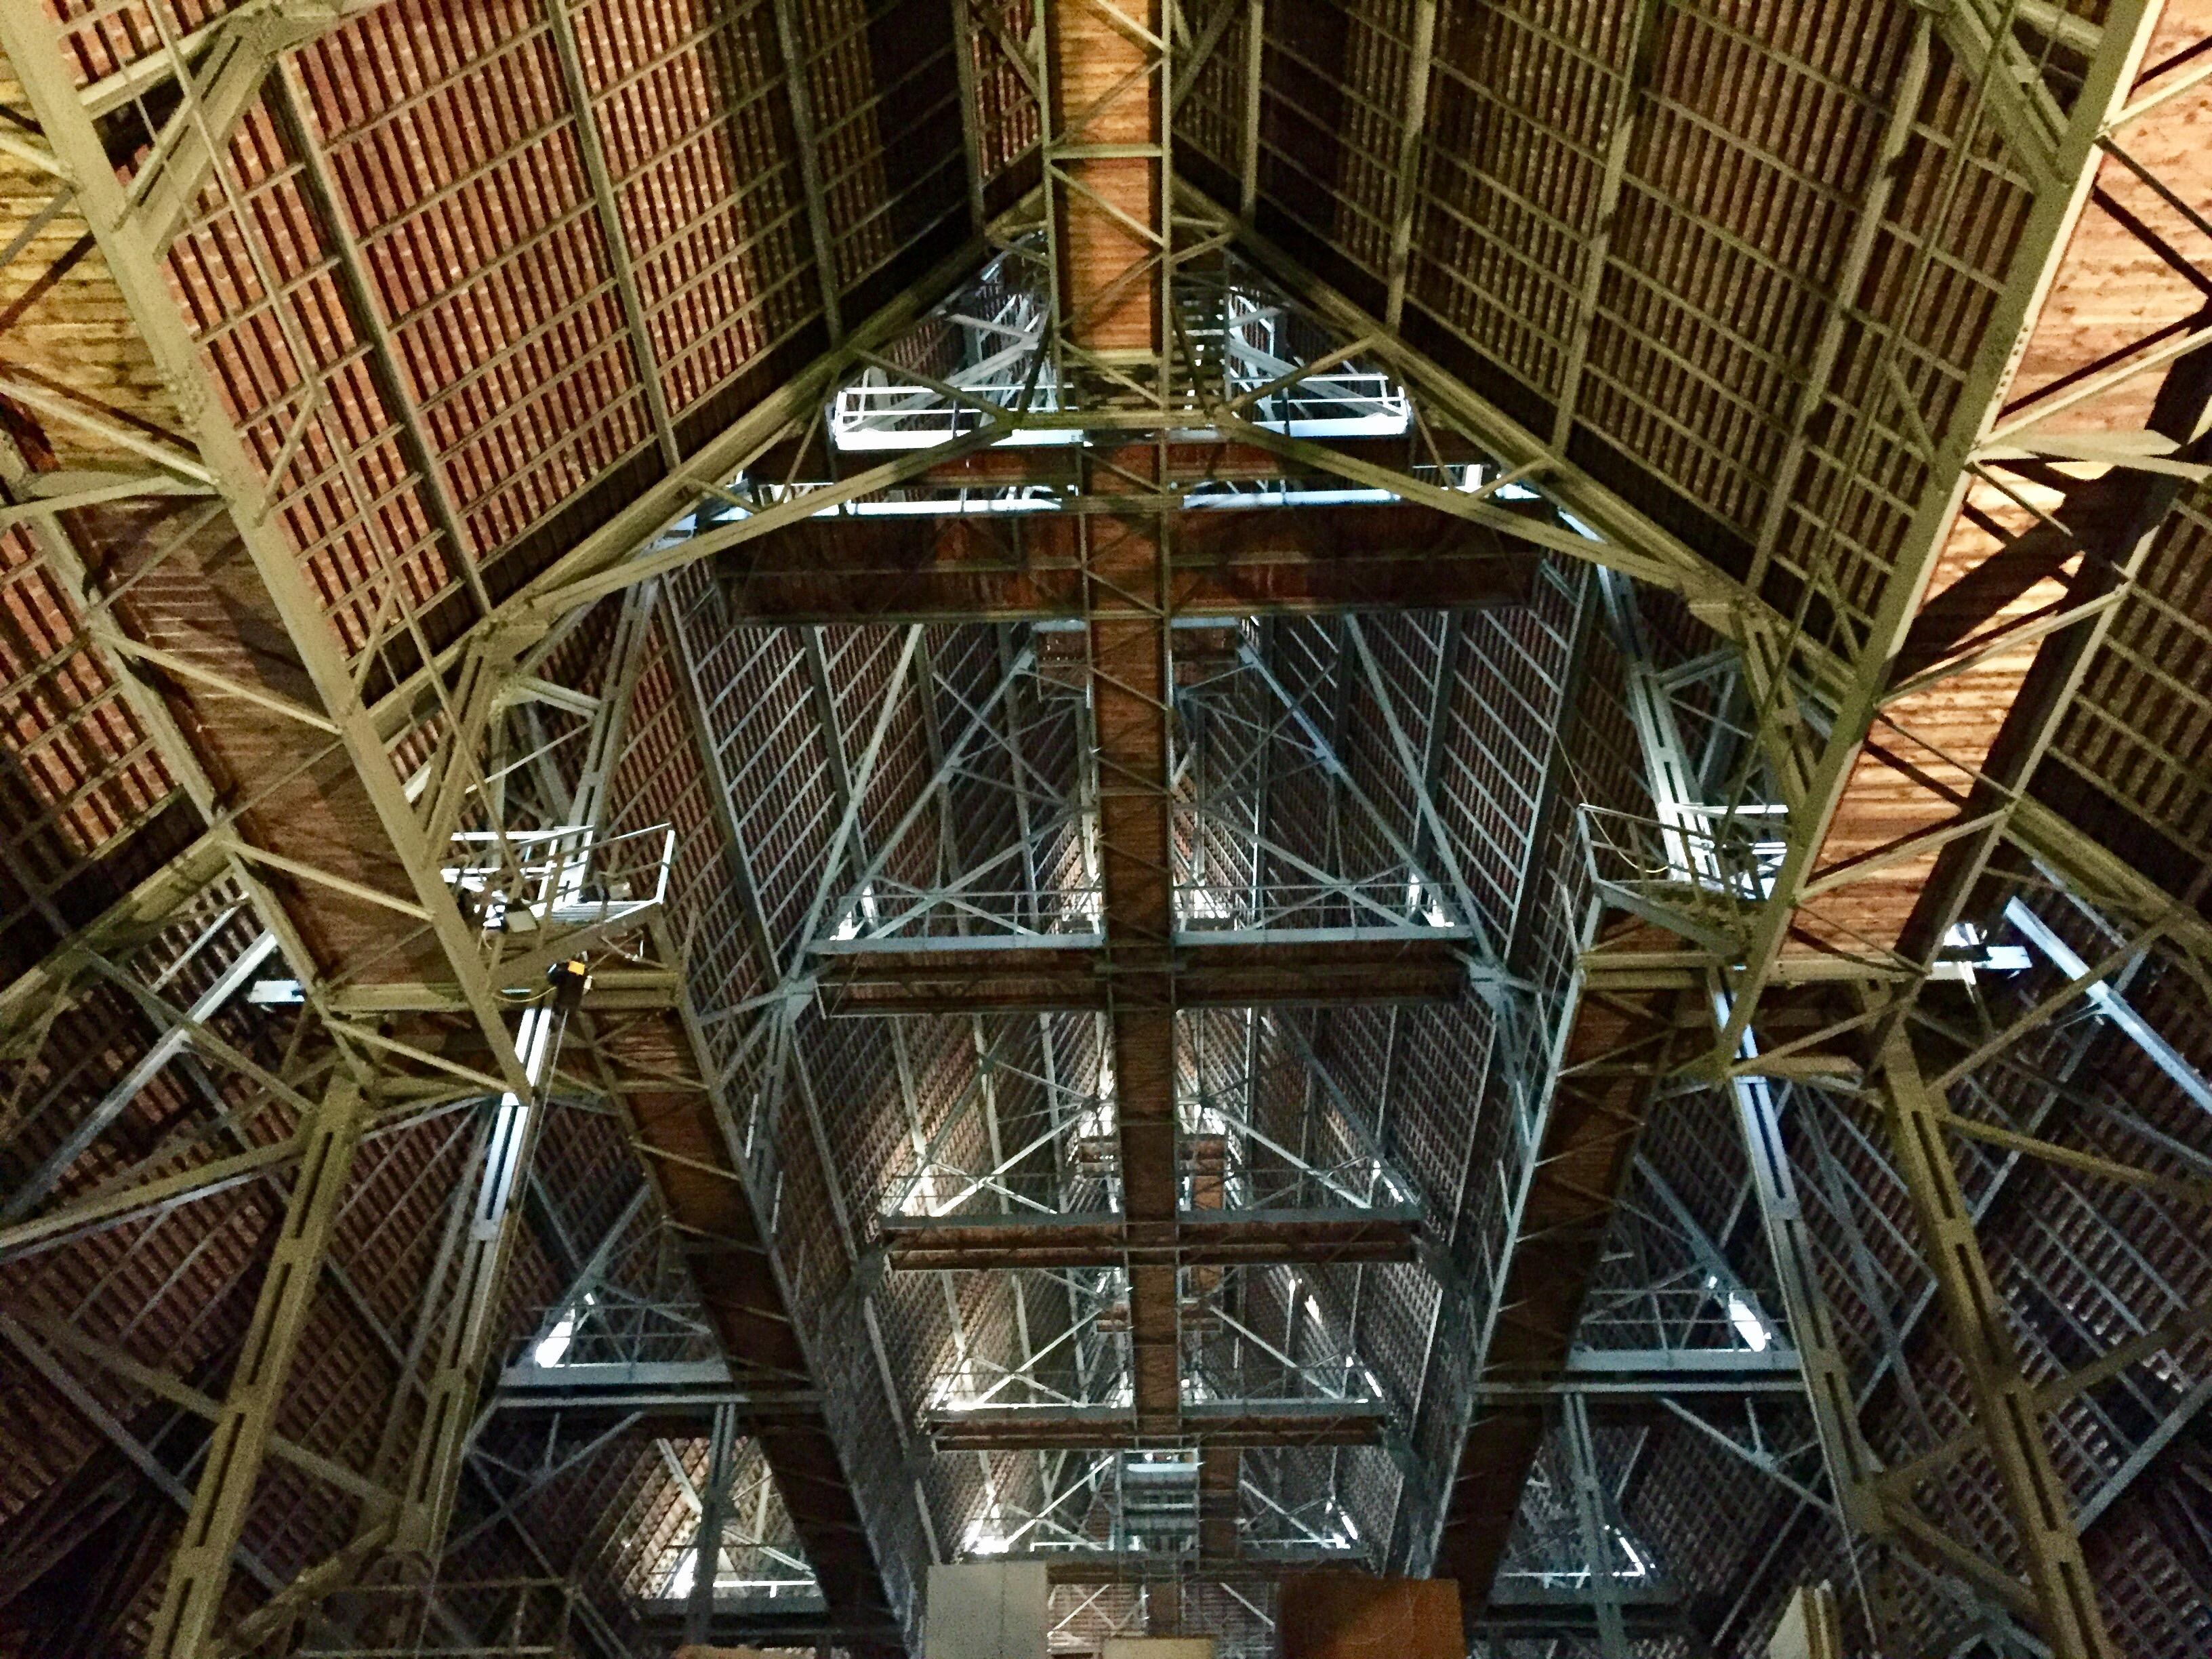 Datei:Dachstuhl aus Stahl im Stephansdom, 20. Jahrhundert.jpg ...